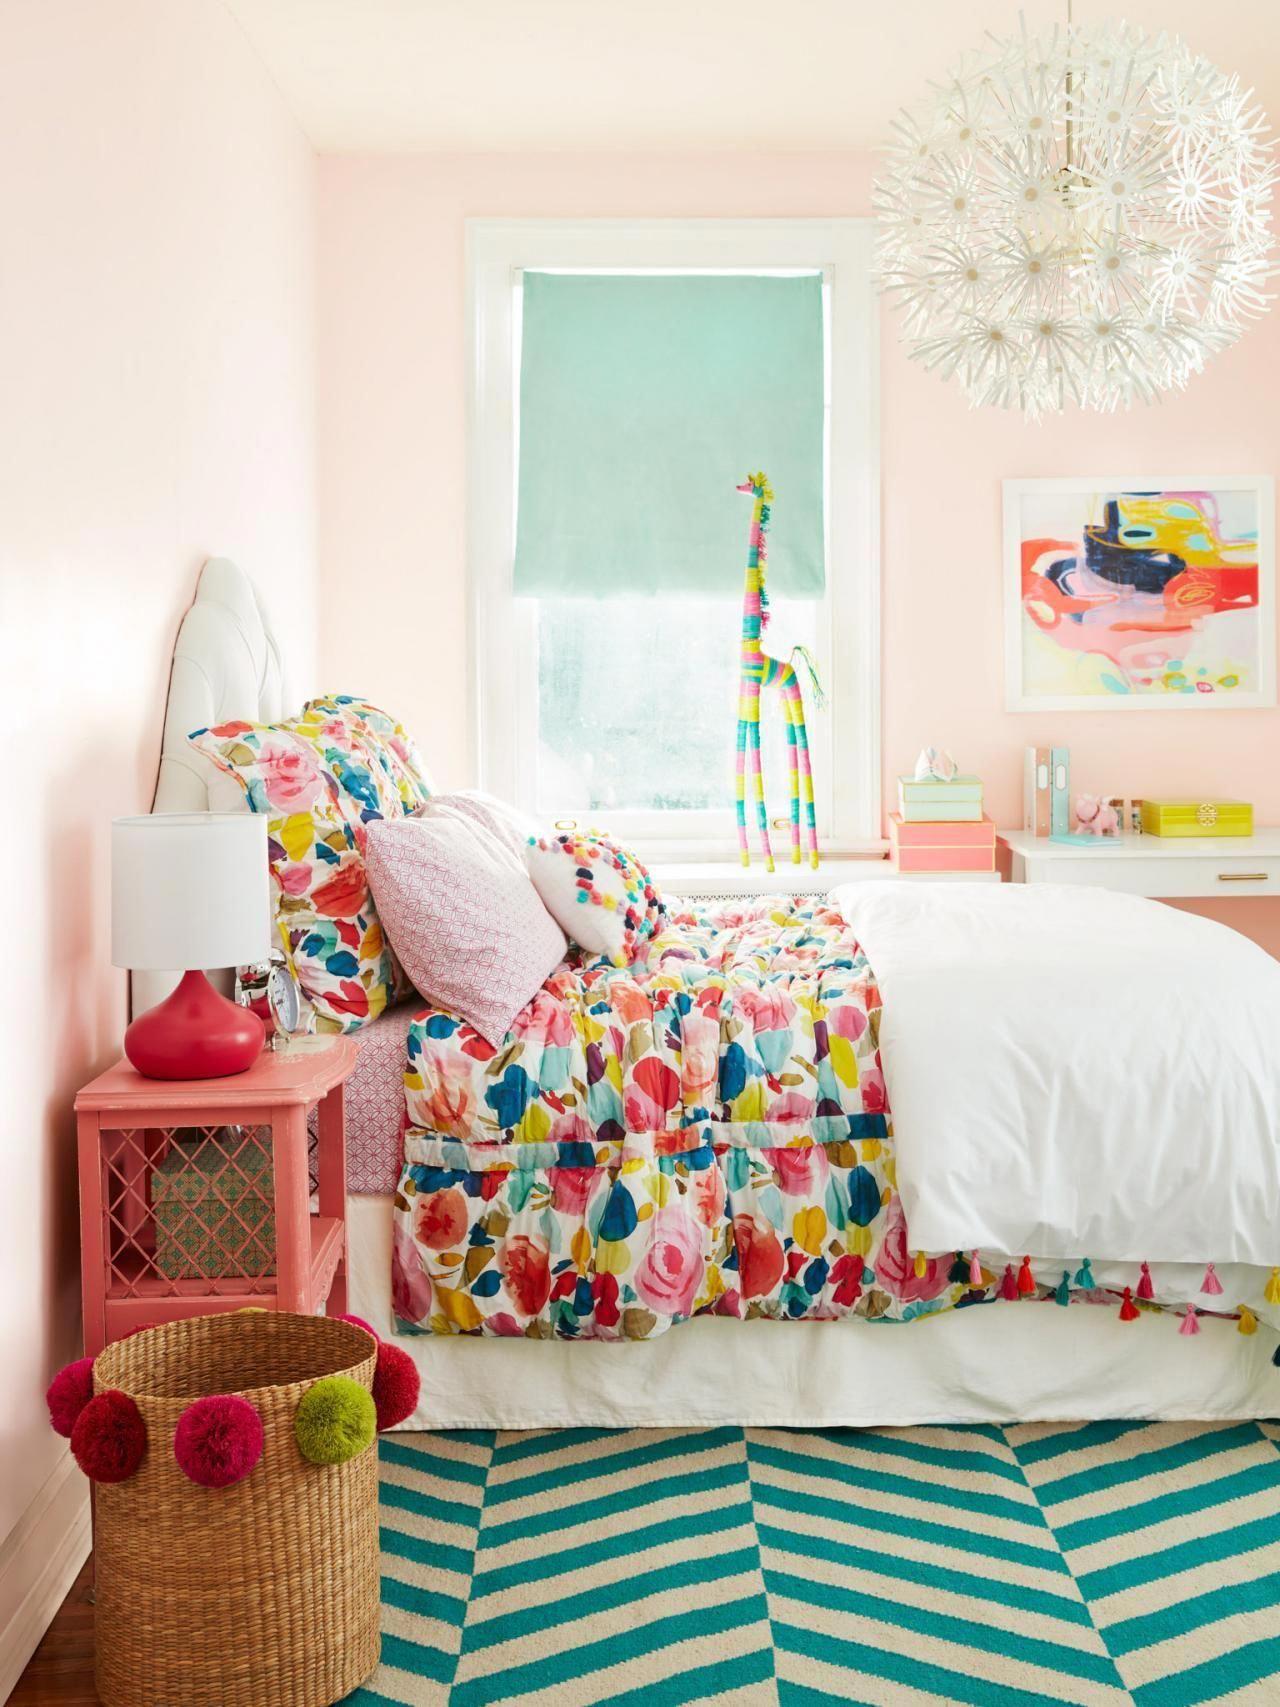 Gi Room Design: Easy Crafts And Homemade